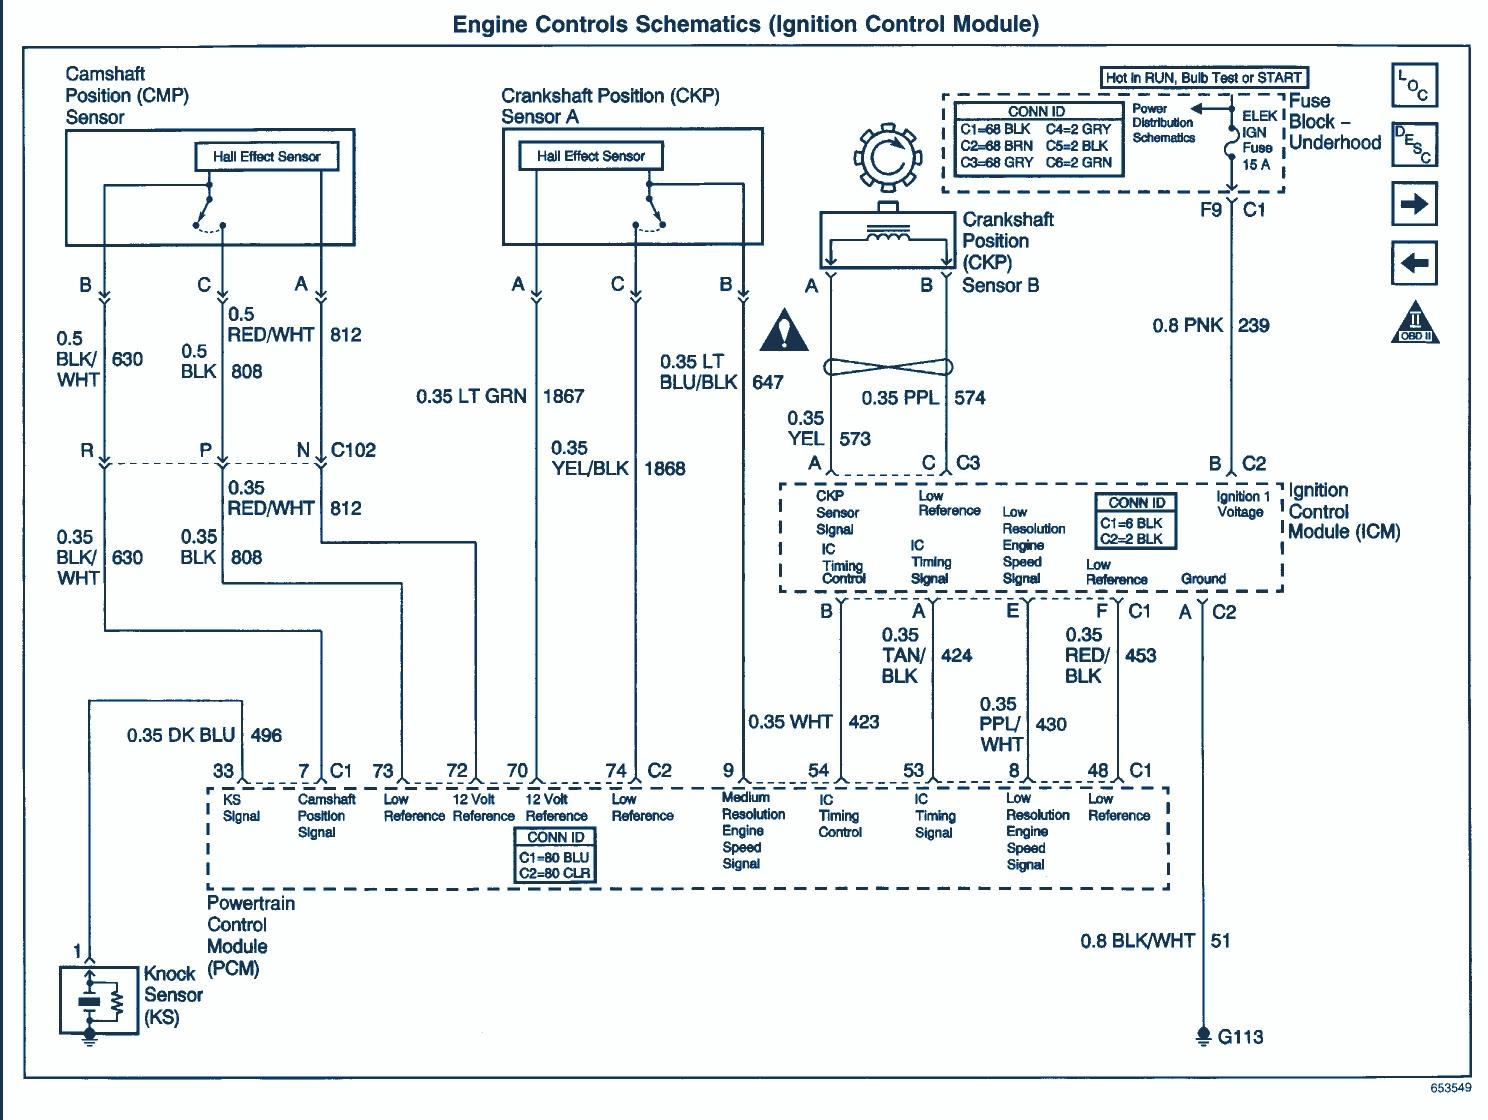 stereo wiring diagram pontiac grand prix wiring diagram g11 2006 Pontiac Grand Prix Ignition Wiring Diagram